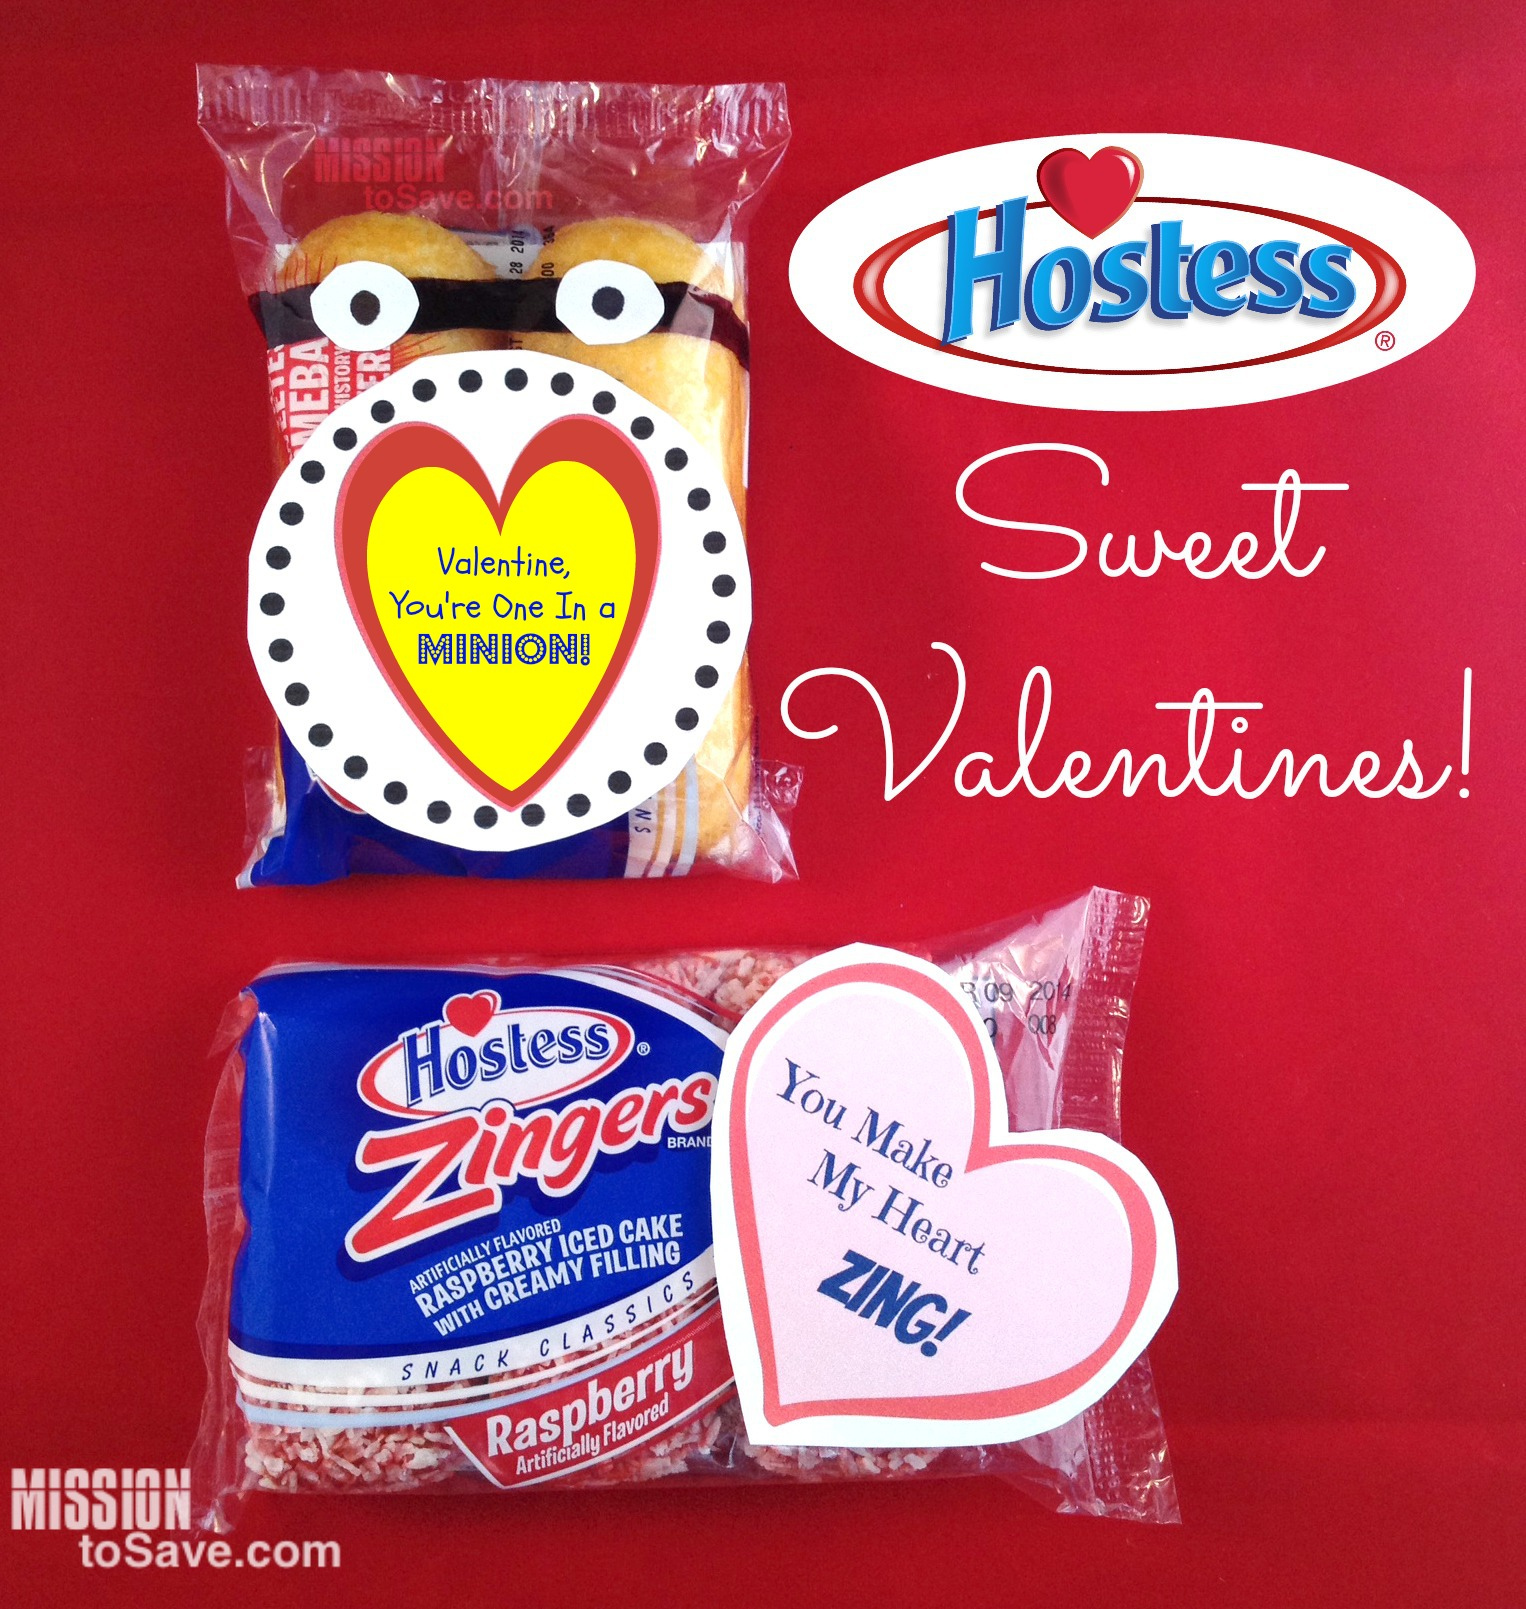 Sweet Hostess Valentines (+ Free Printable Tags)